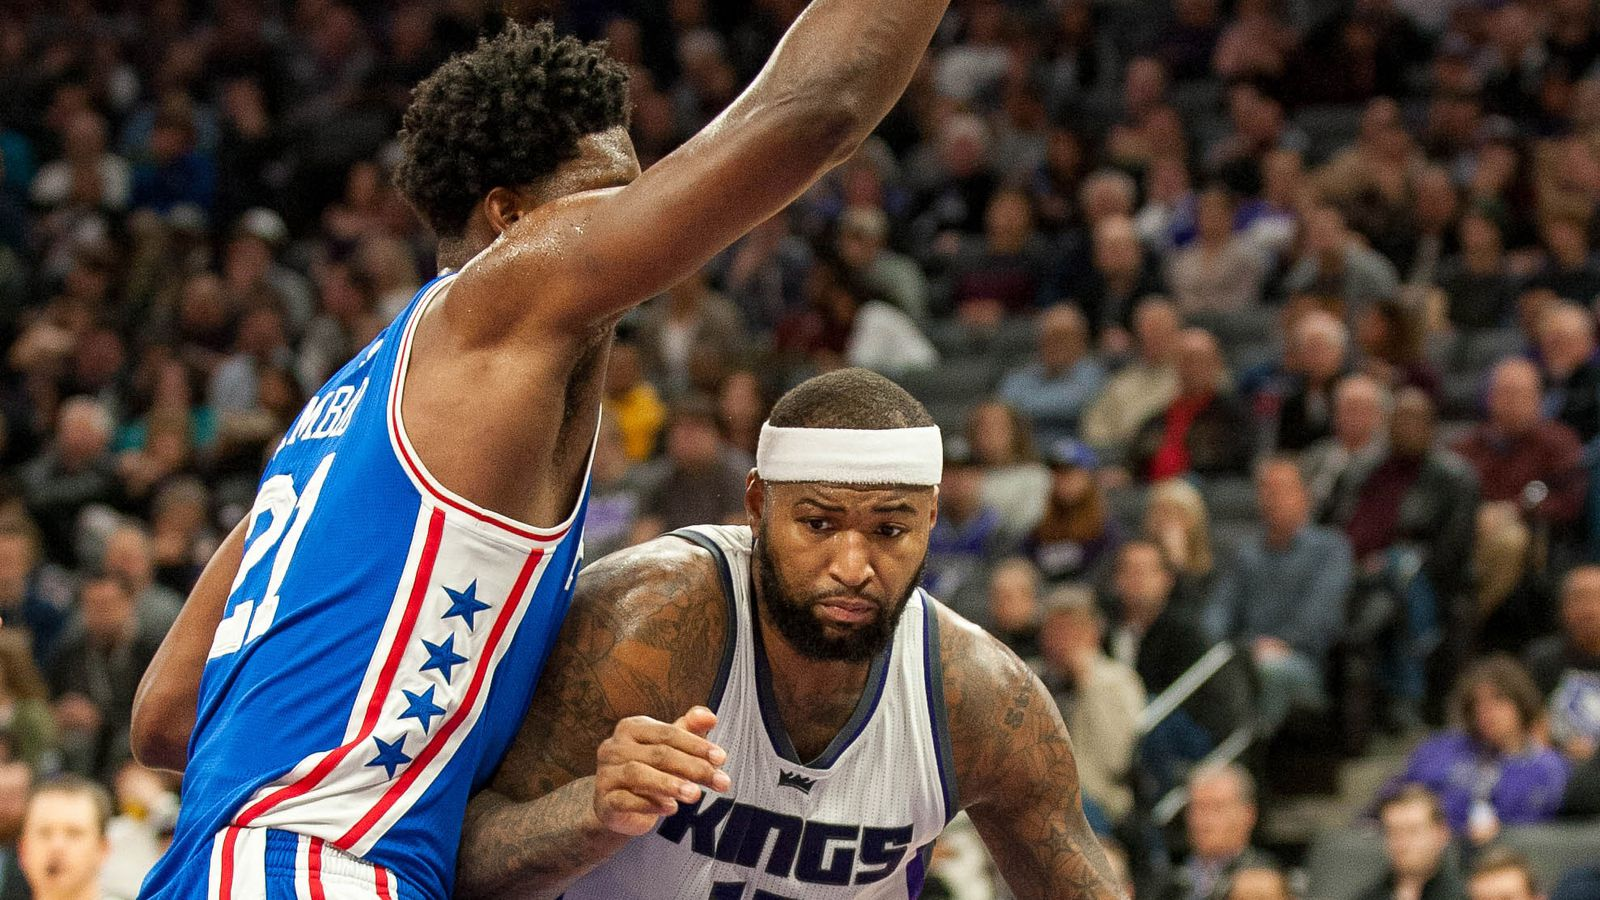 76ers Vs Kings News: Kings Vs. 76ers Game Thread